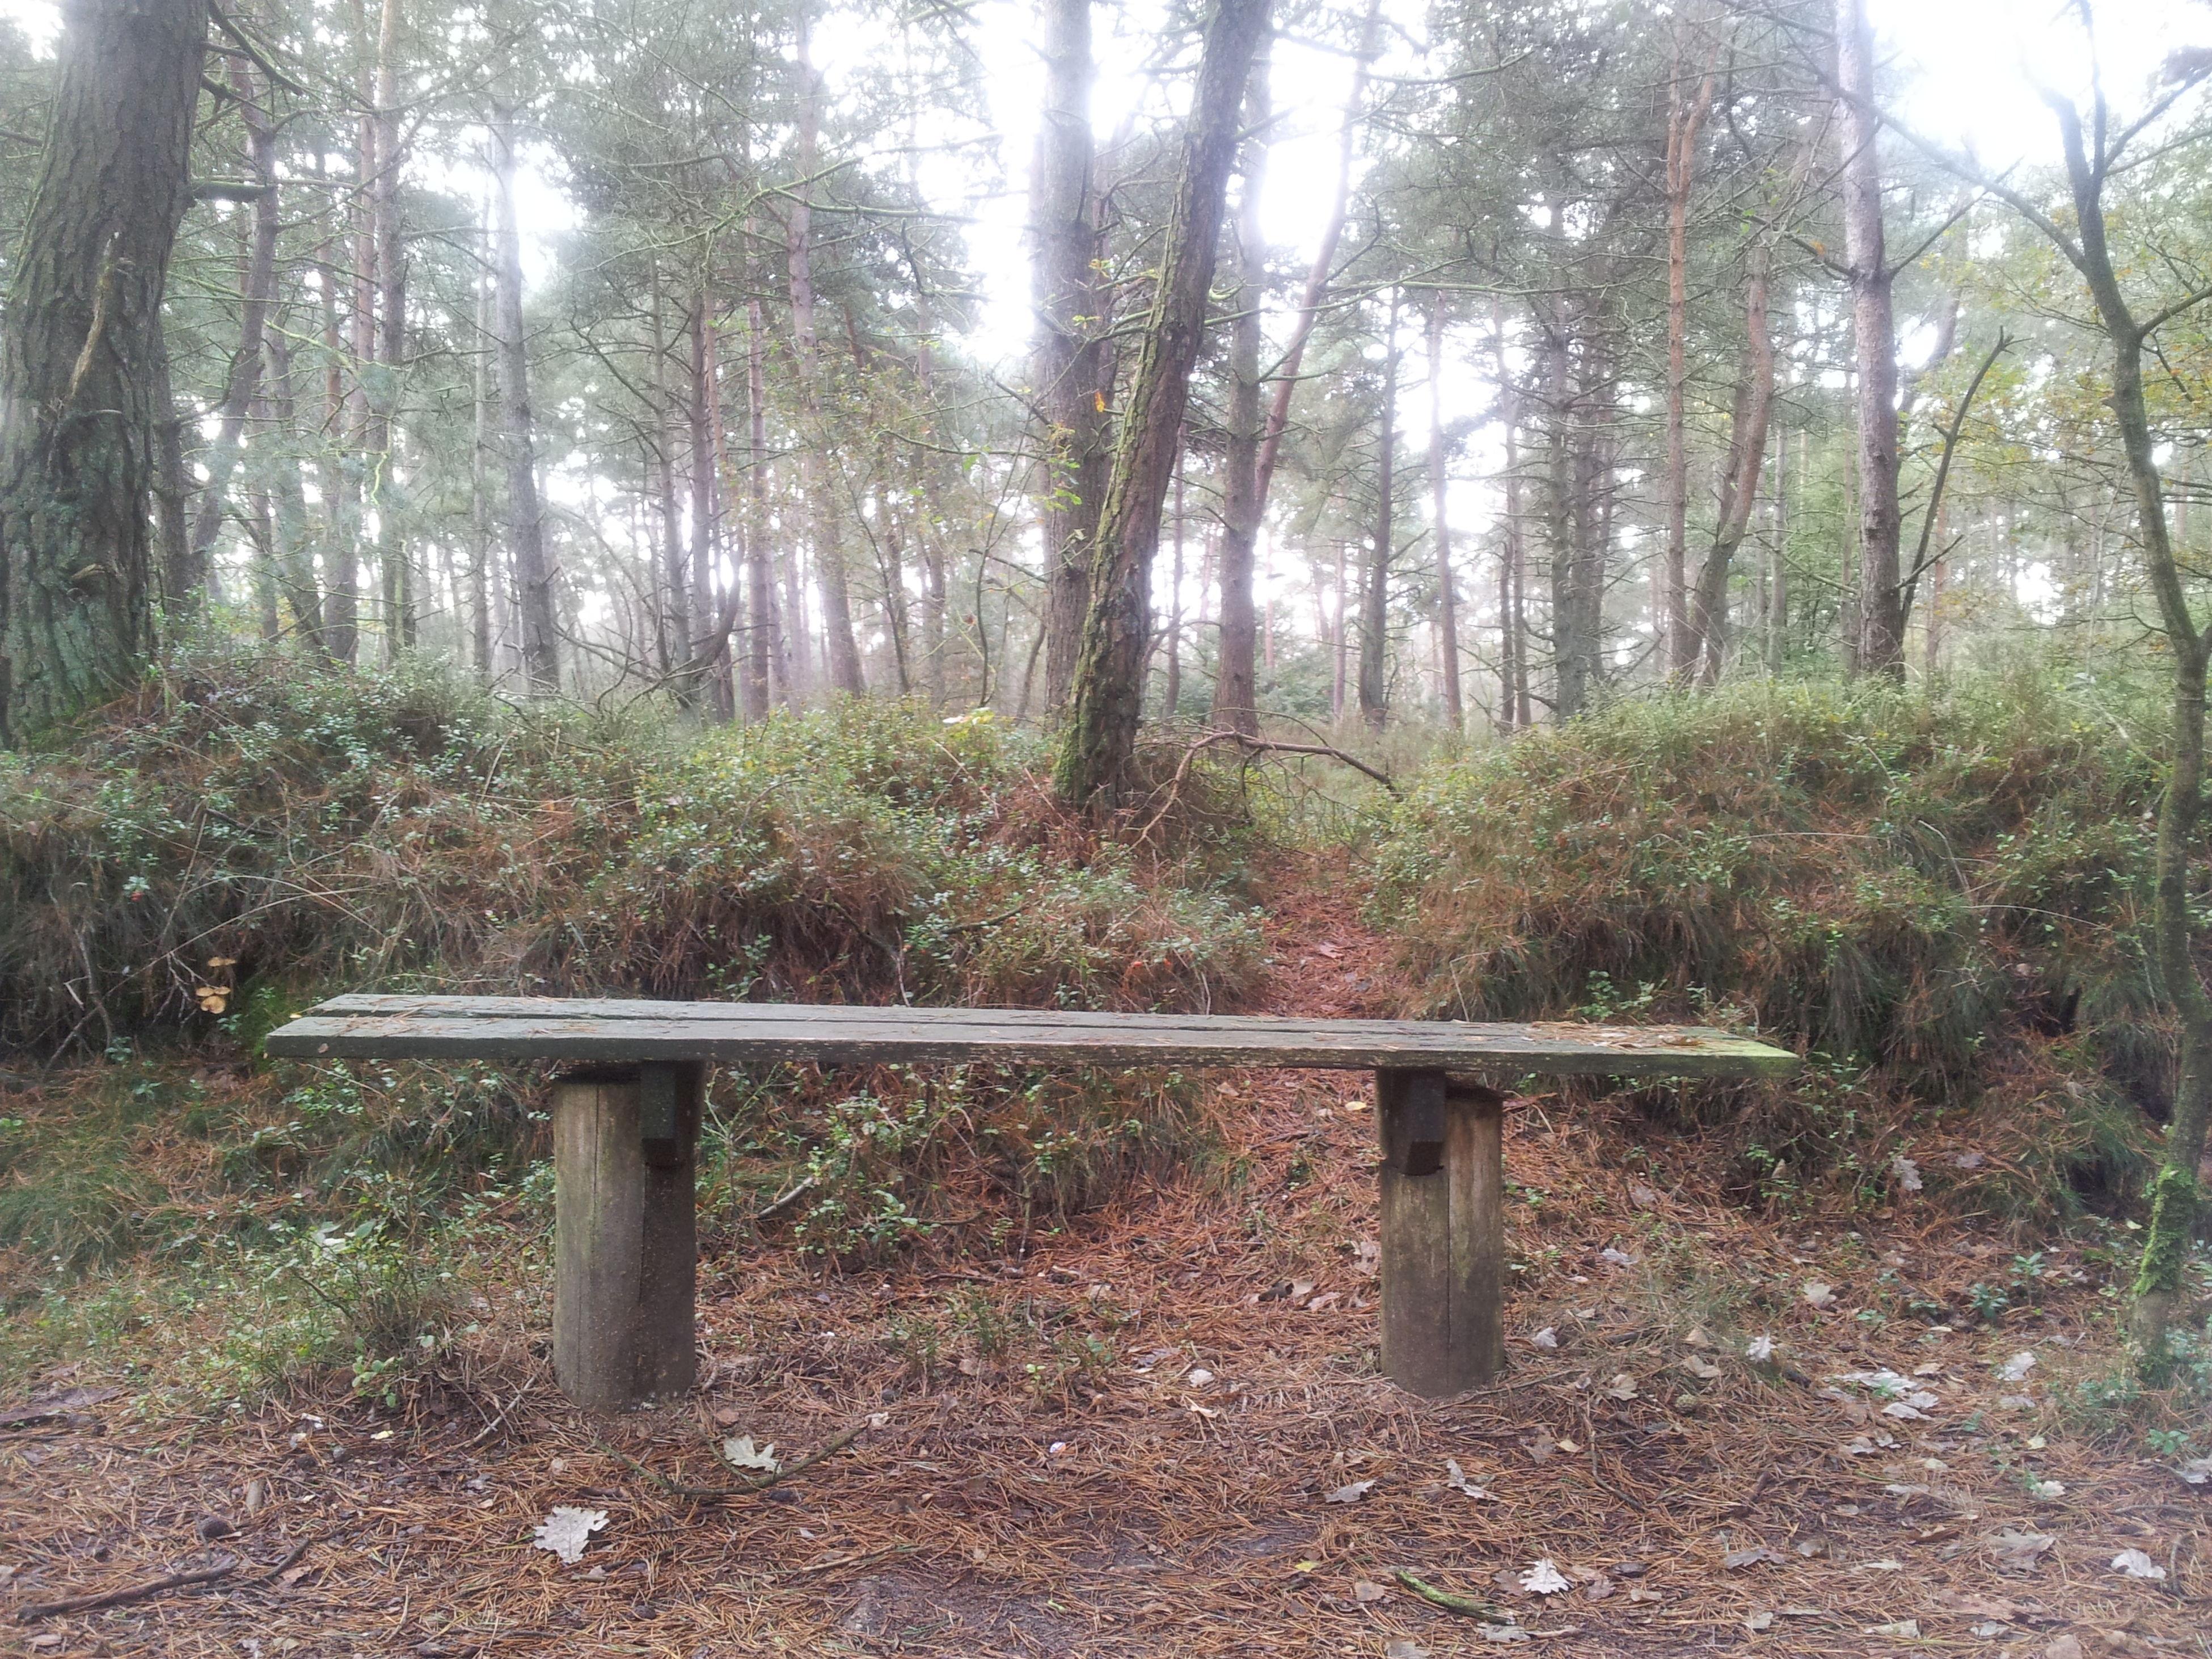 Nature Rest TheMinimals (less Edit Juxt Photography)